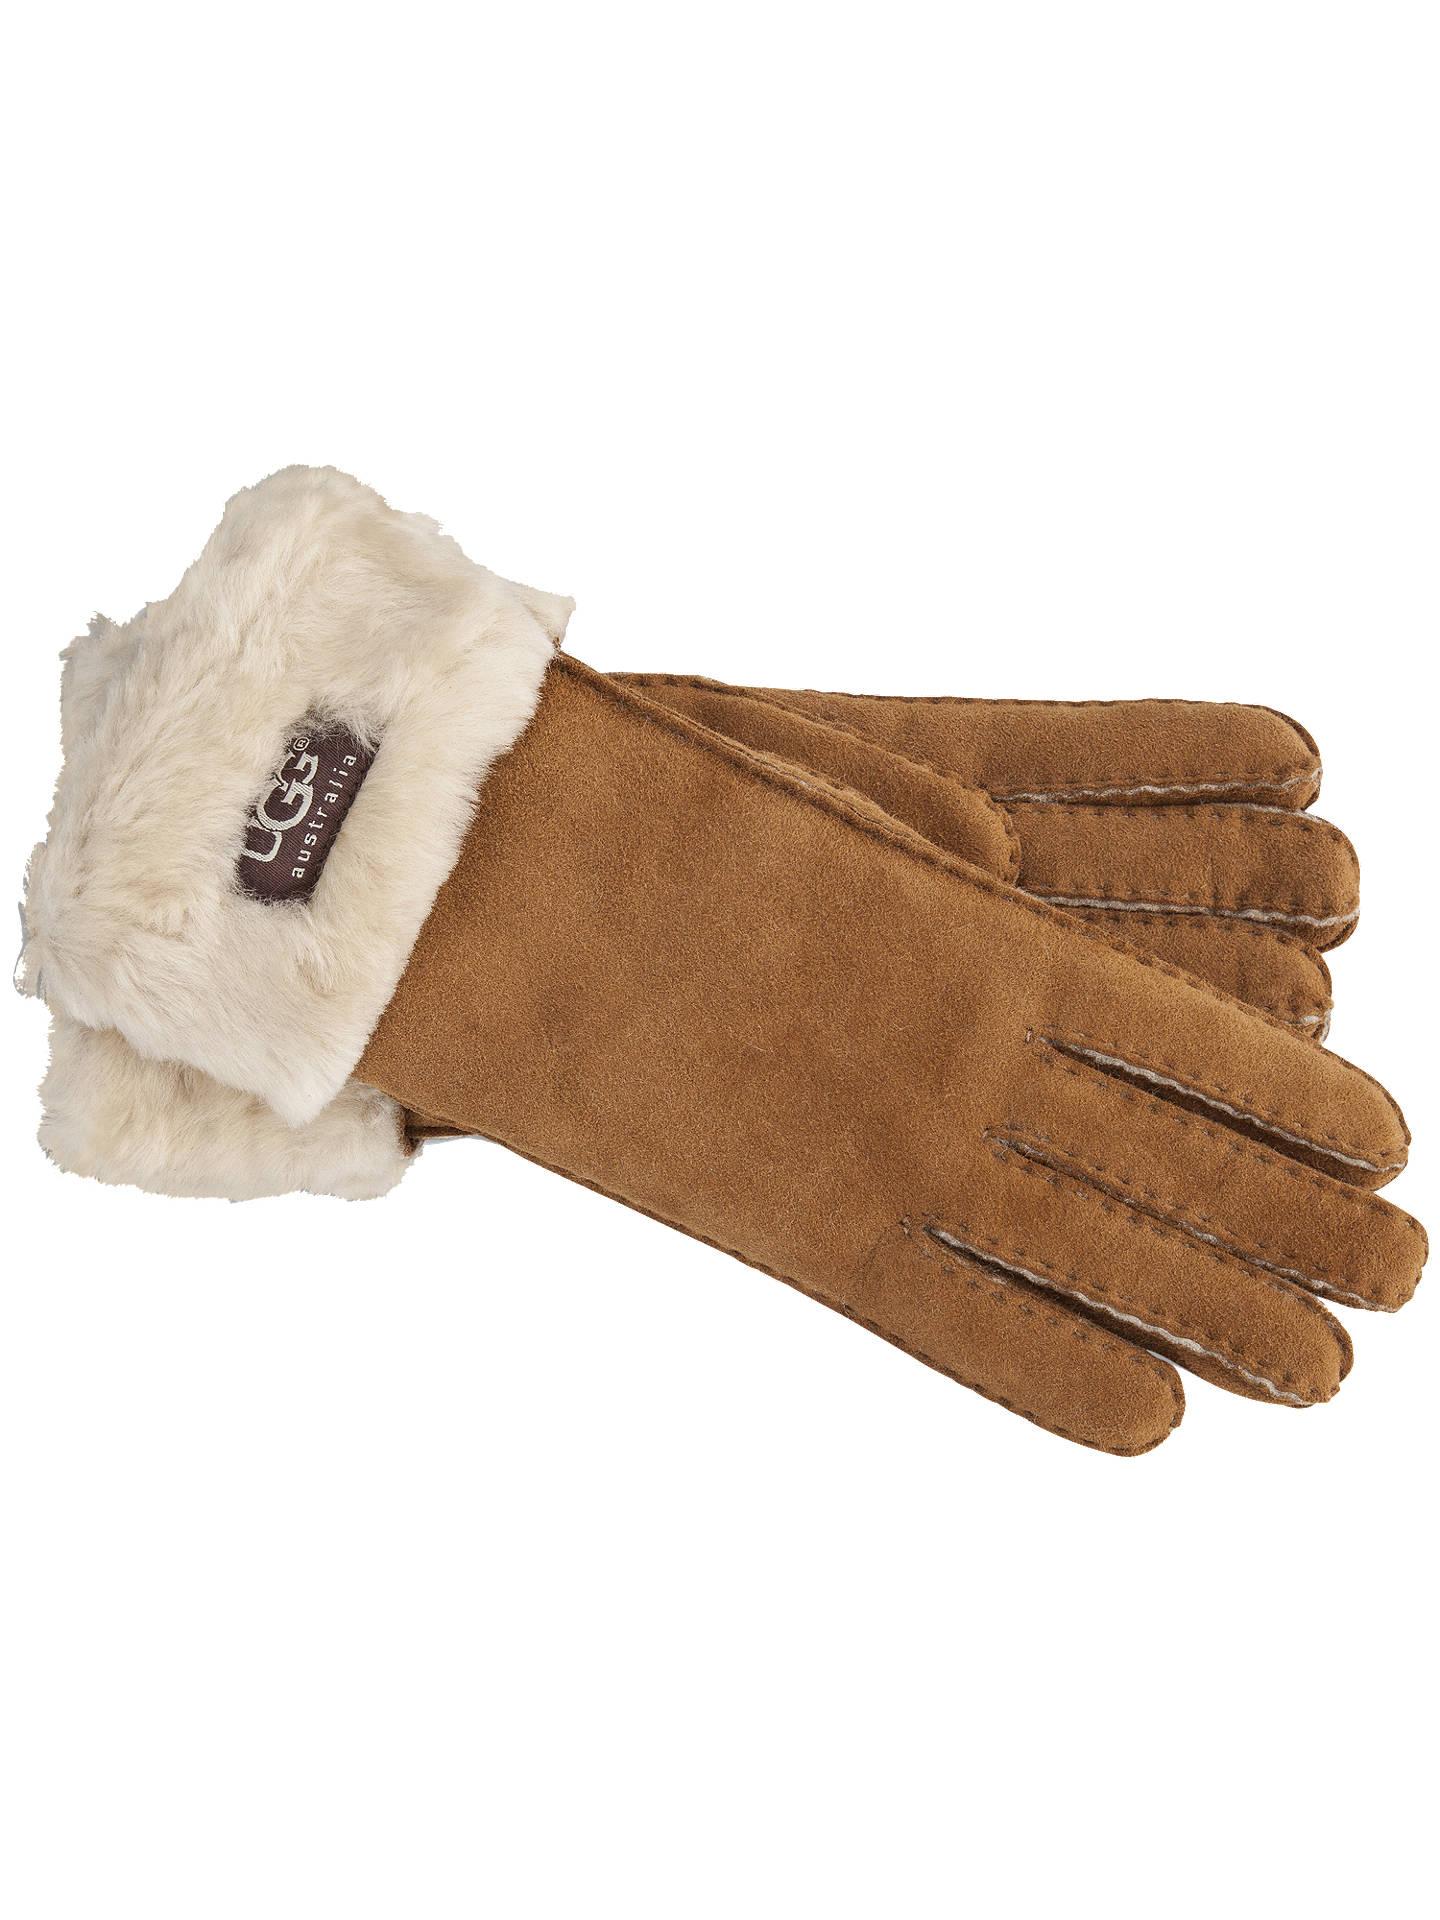 38d67f75f6f UGG Shearling Sheepskin Turn Cuff Gloves at John Lewis & Partners